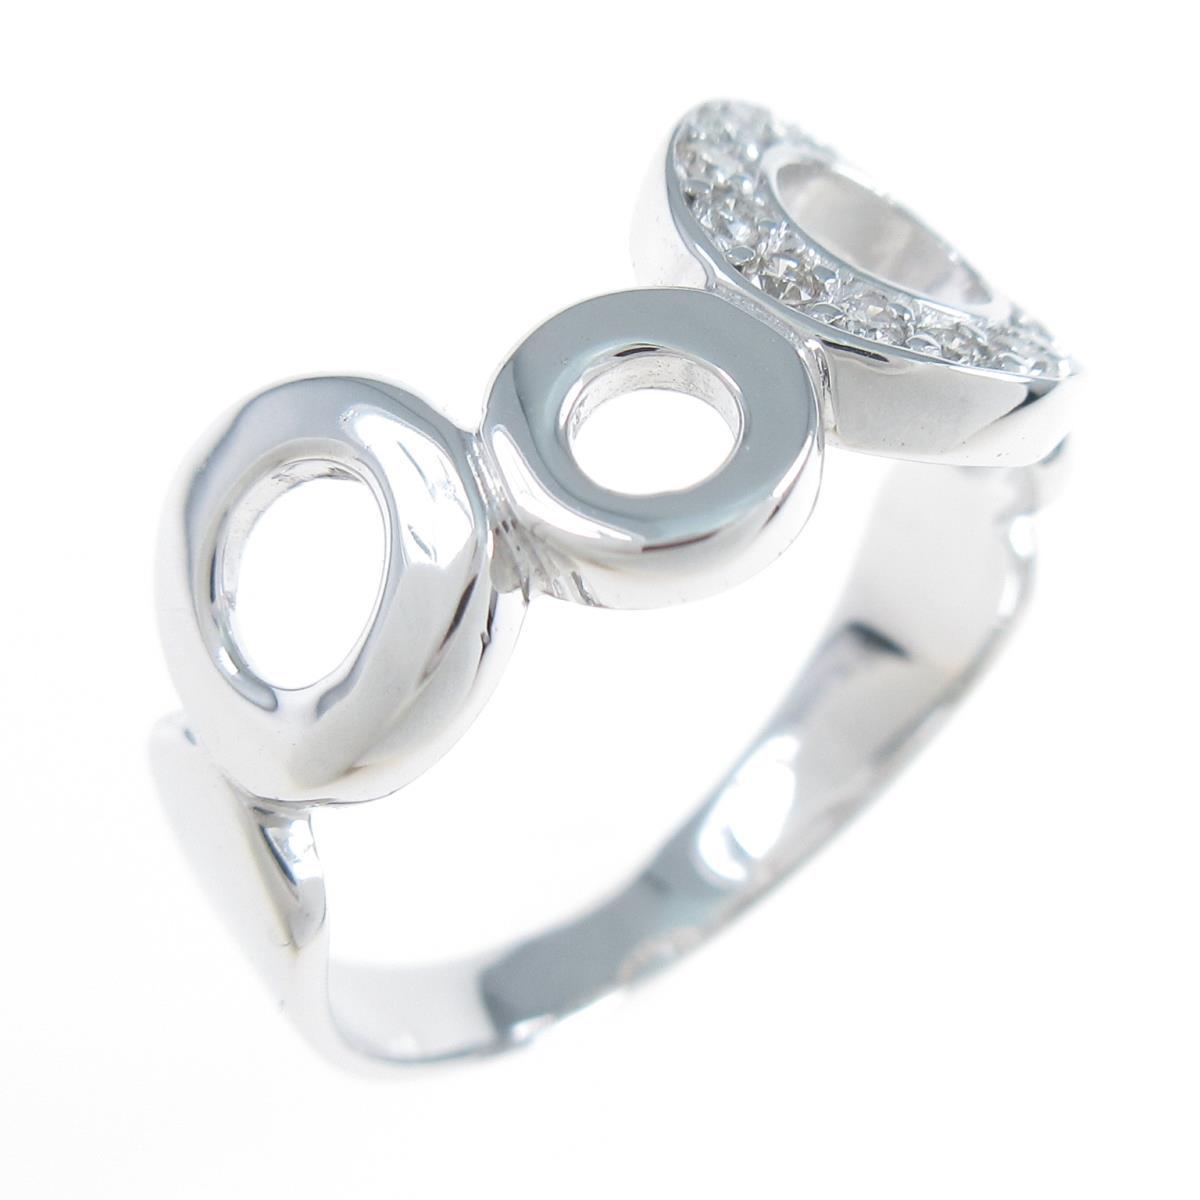 K18WG おすすめ ダイヤモンドリング 日本最大級の品揃え 中古